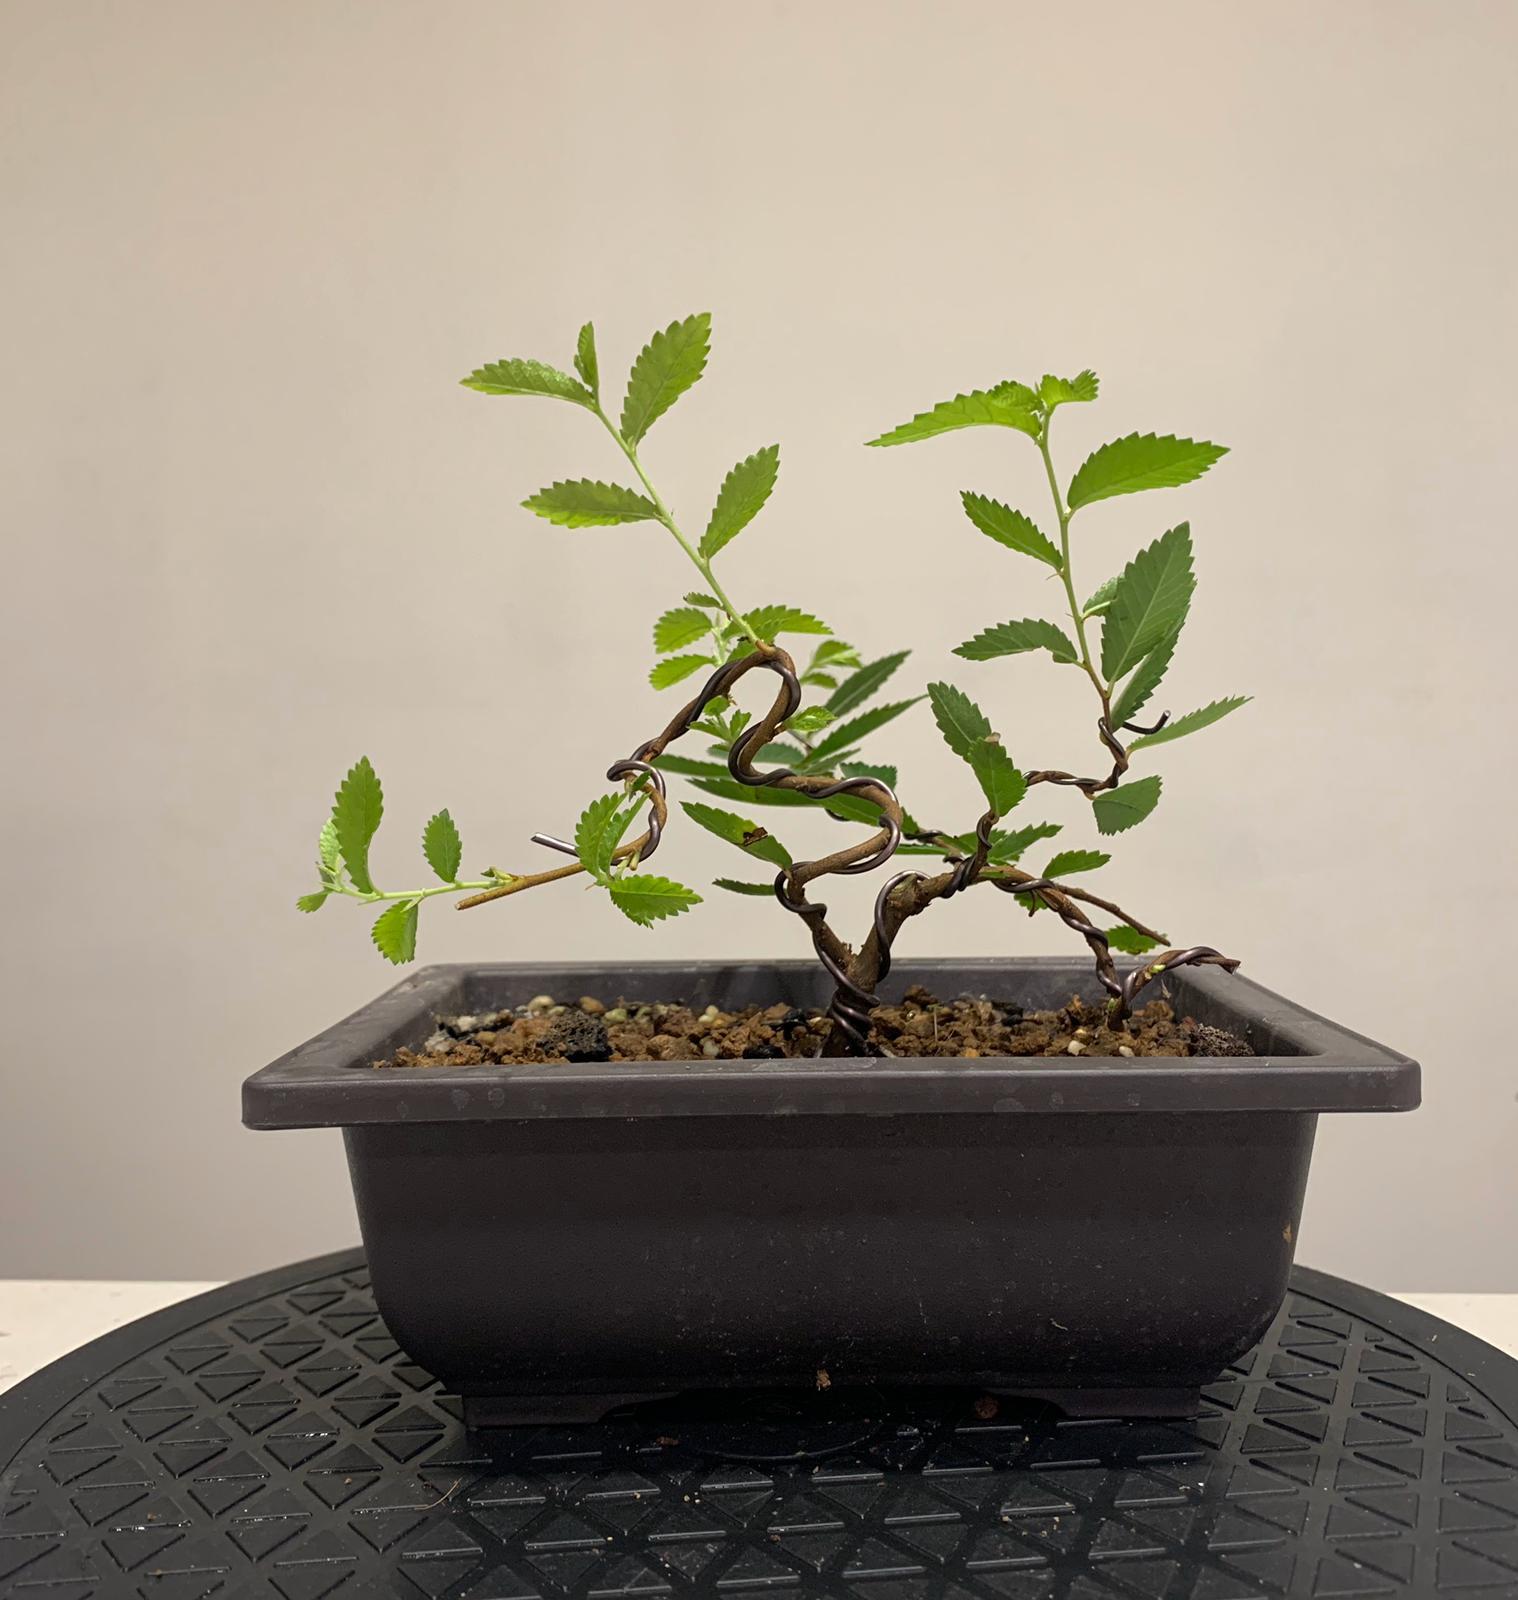 zelkova nire bonsai